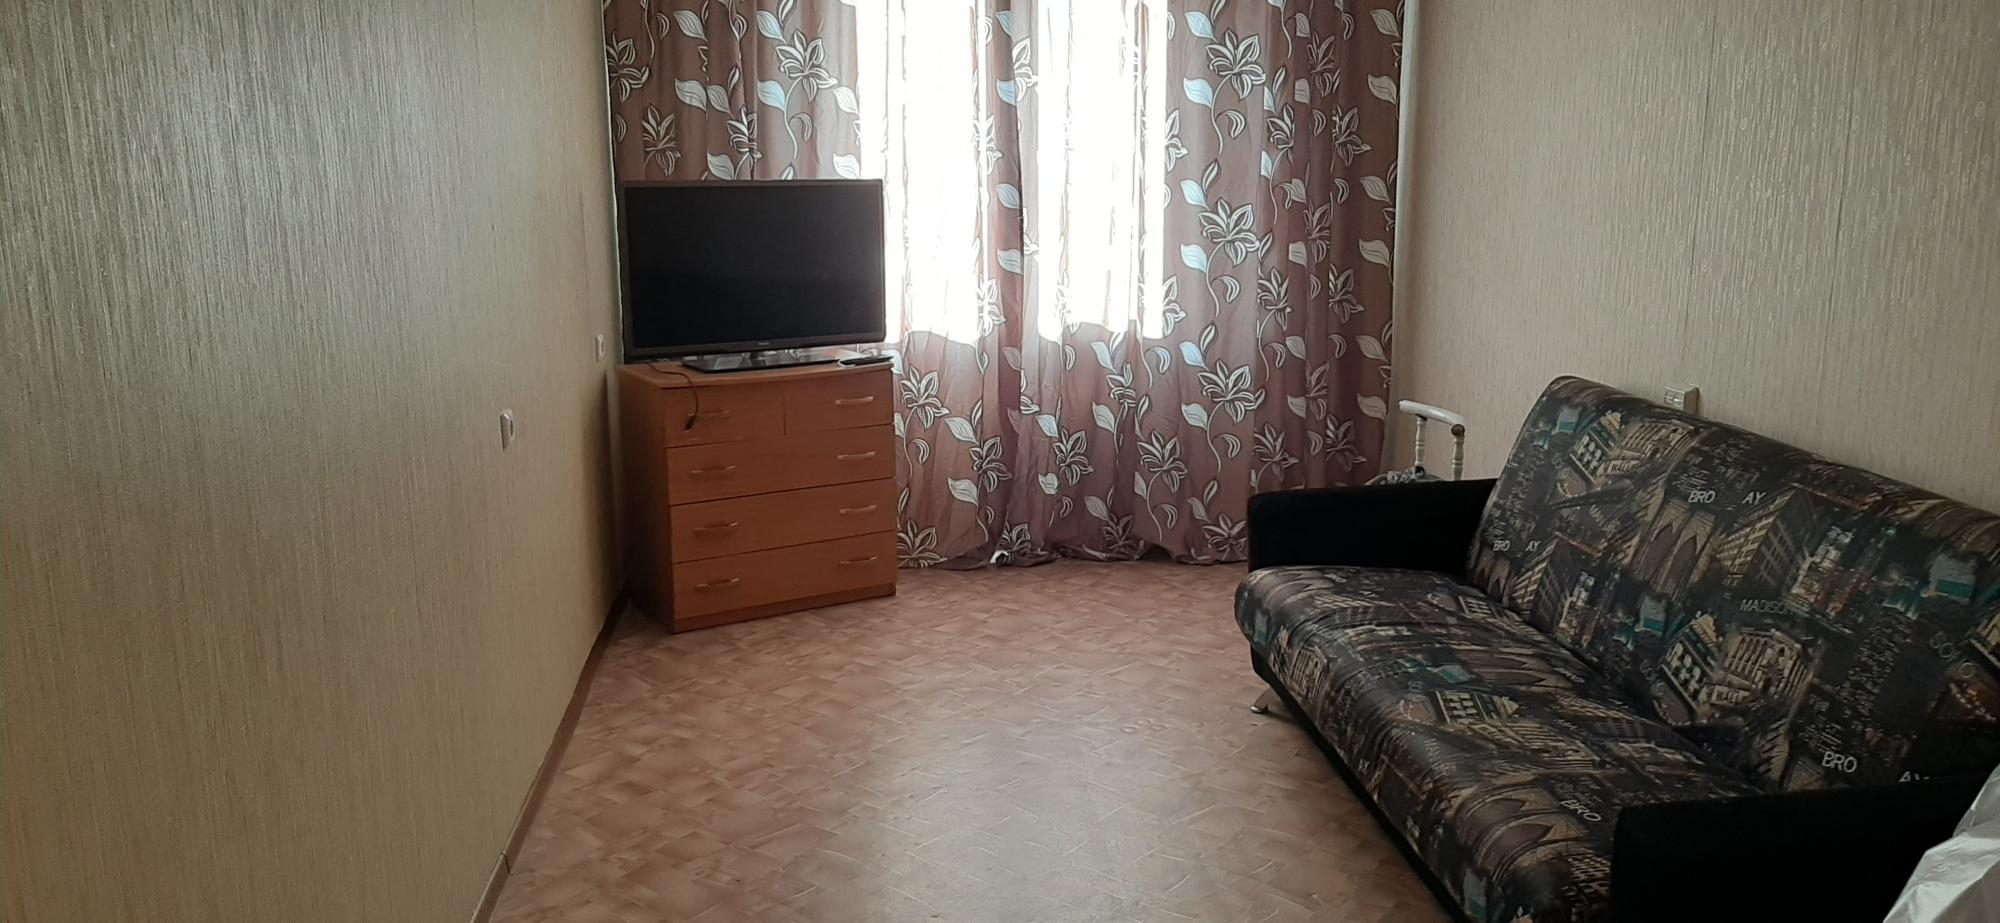 1к квартира Сопочная улица, 36 | 12000 | аренда в Красноярске фото 1